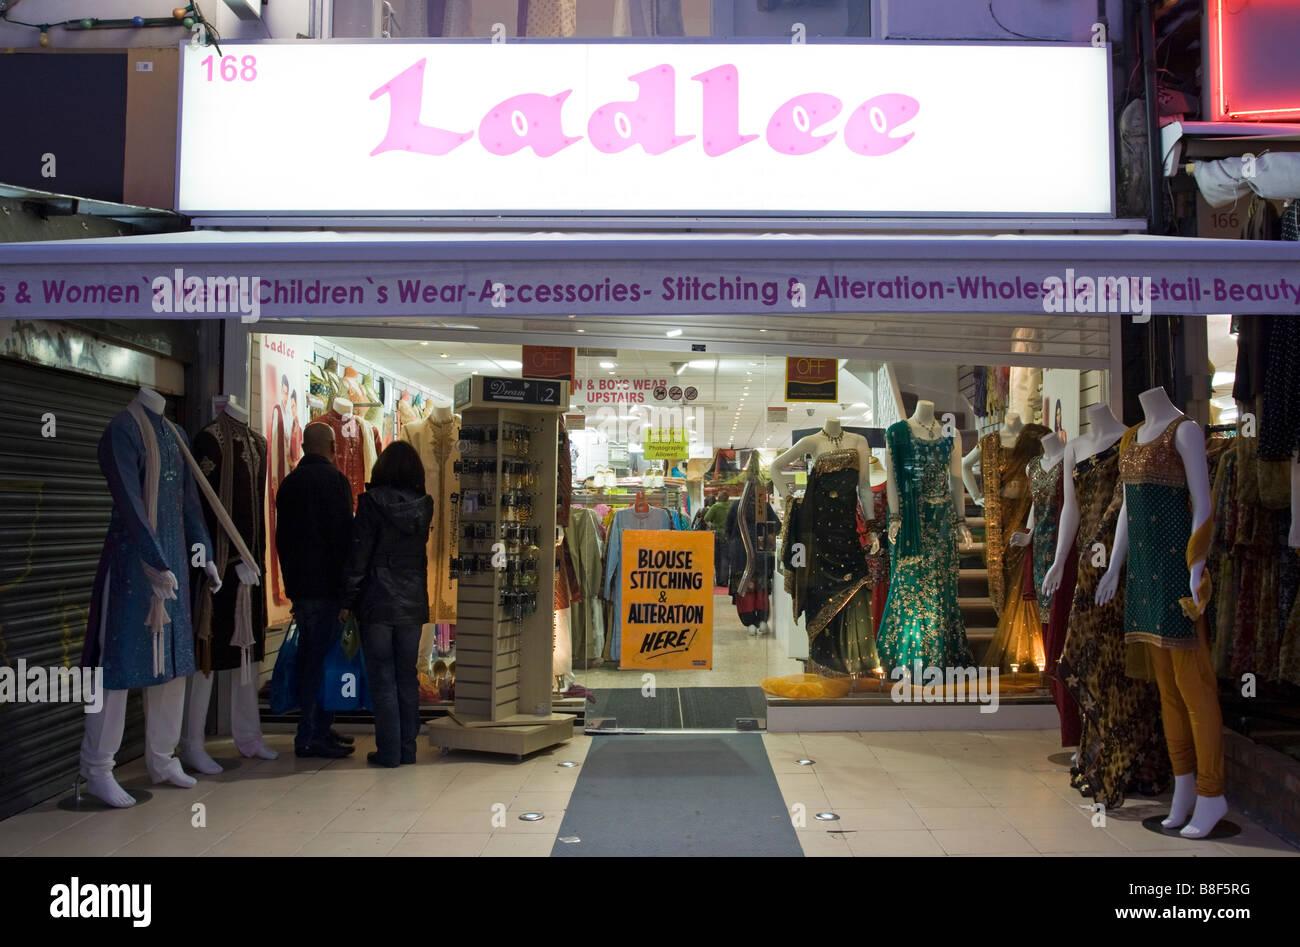 67d3bf9e22 Indian Clothes Stock Photos & Indian Clothes Stock Images - Alamy